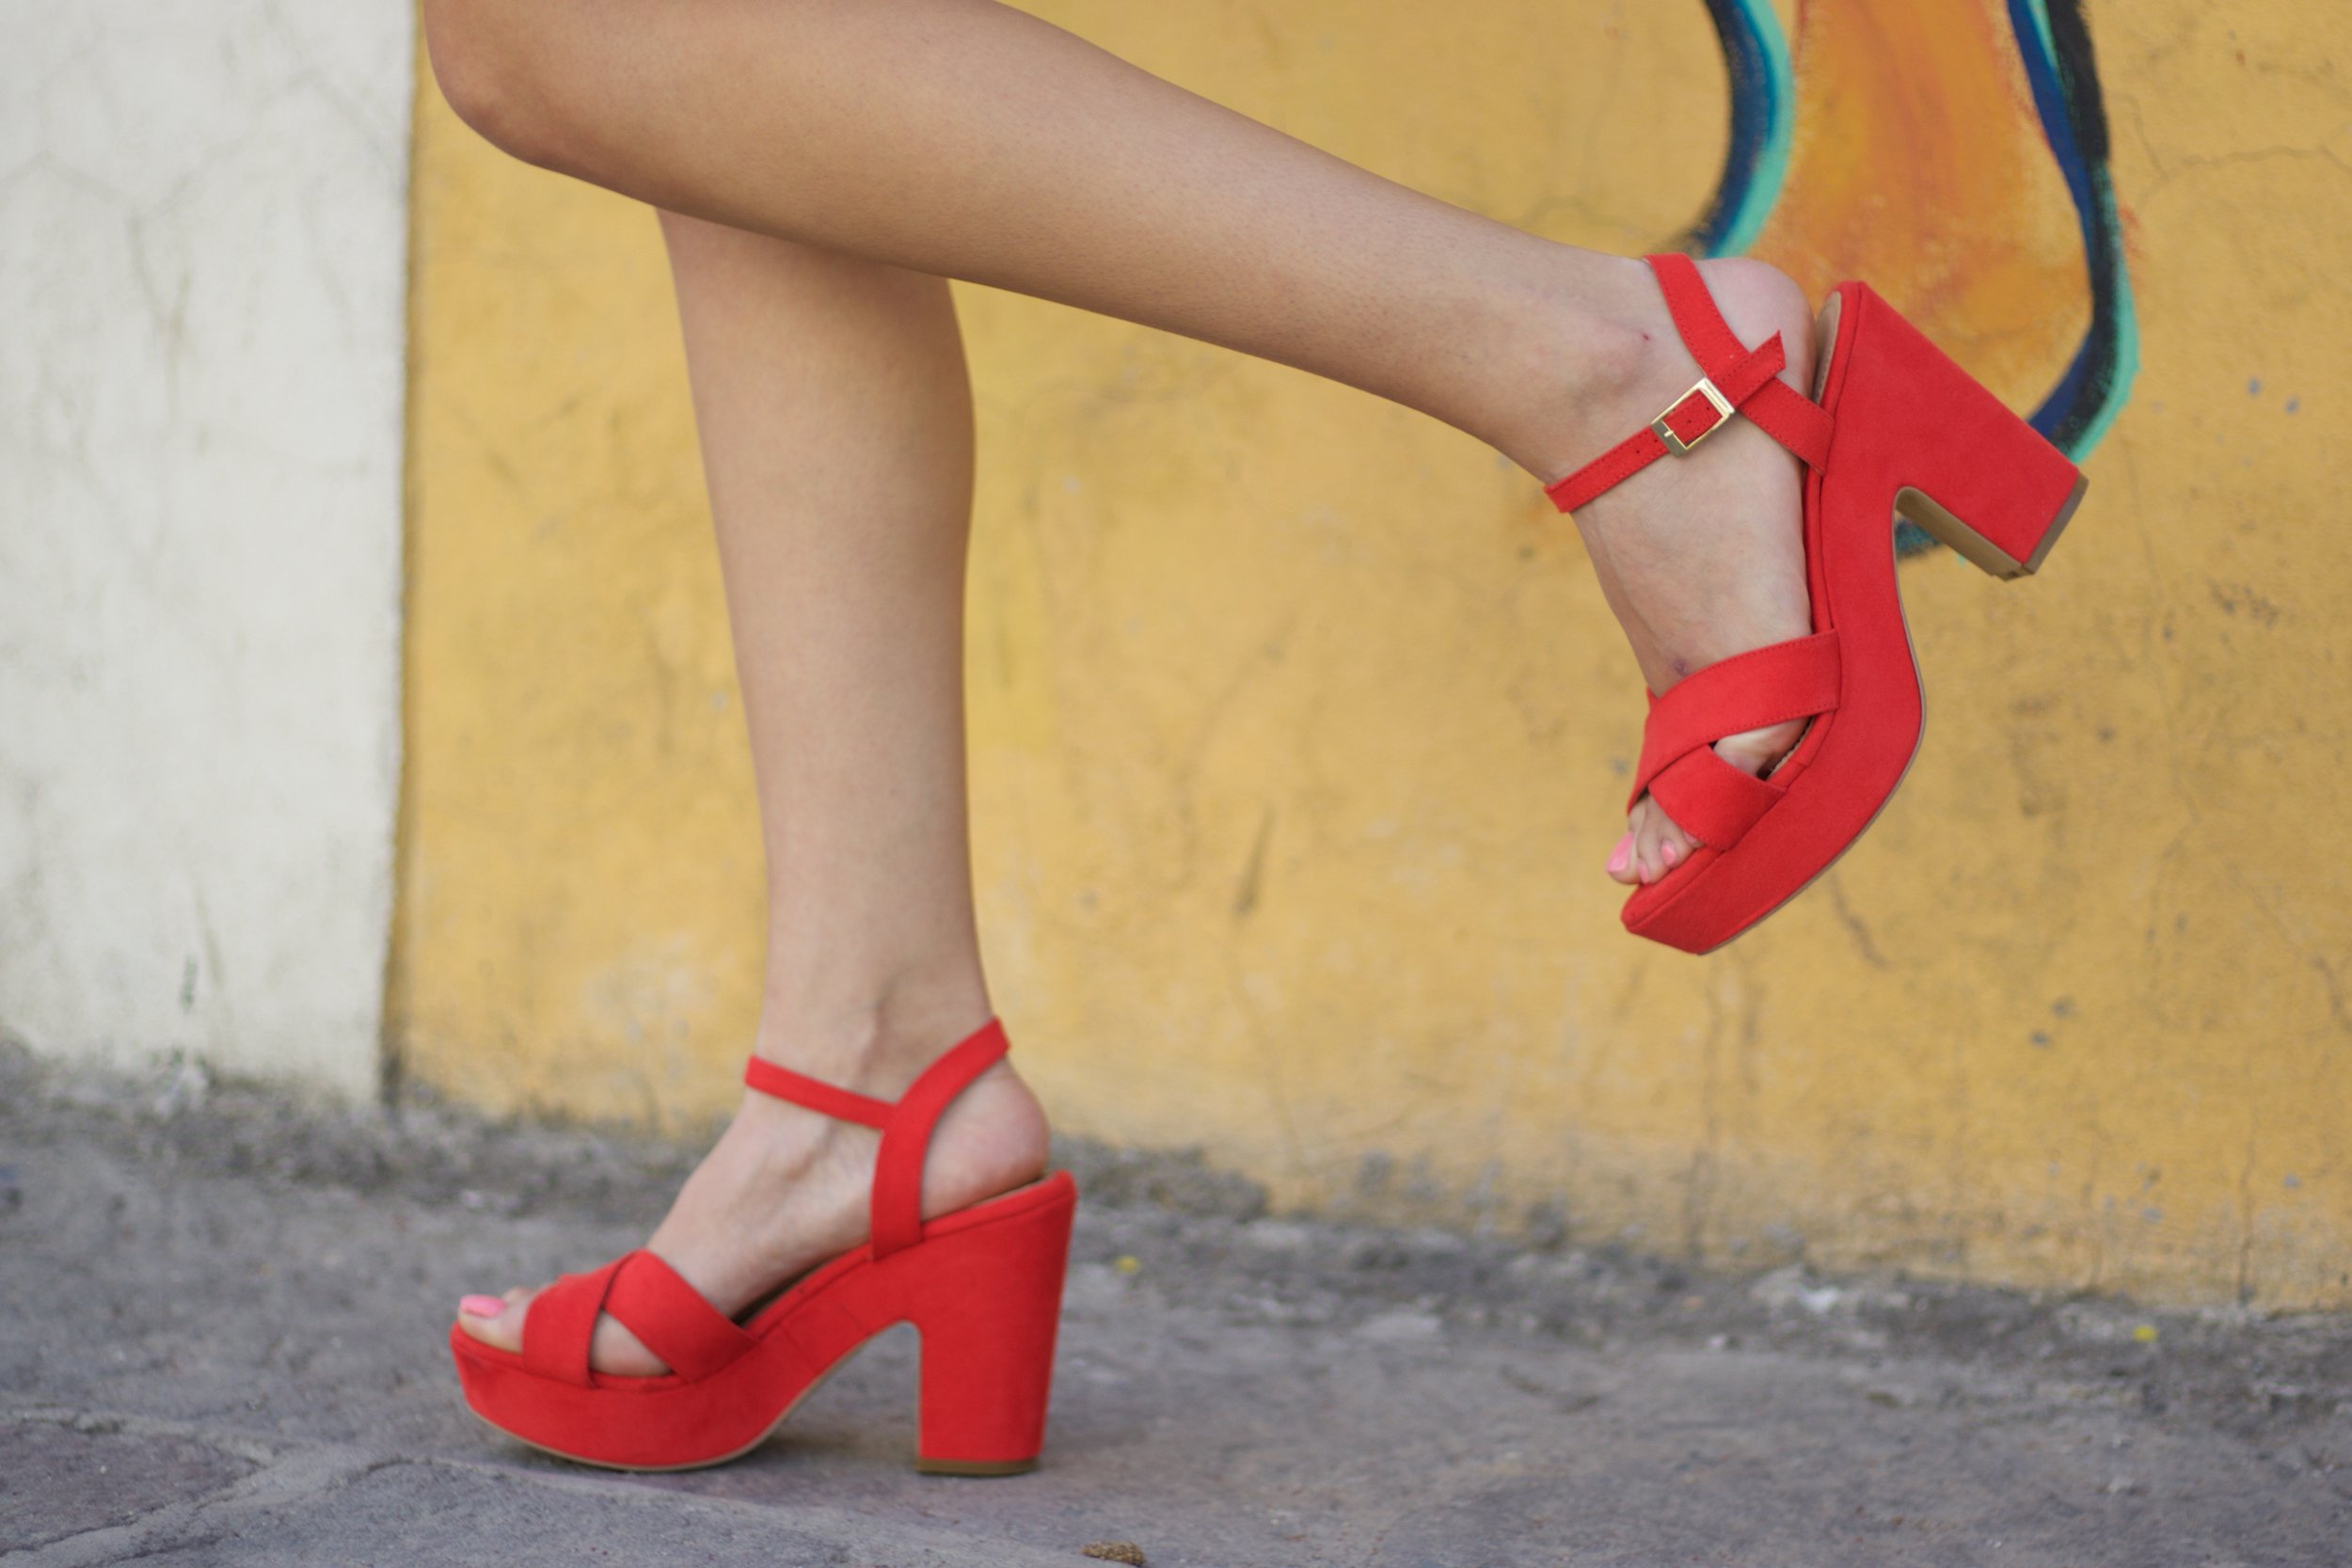 Shoes Dorothy Gaynor